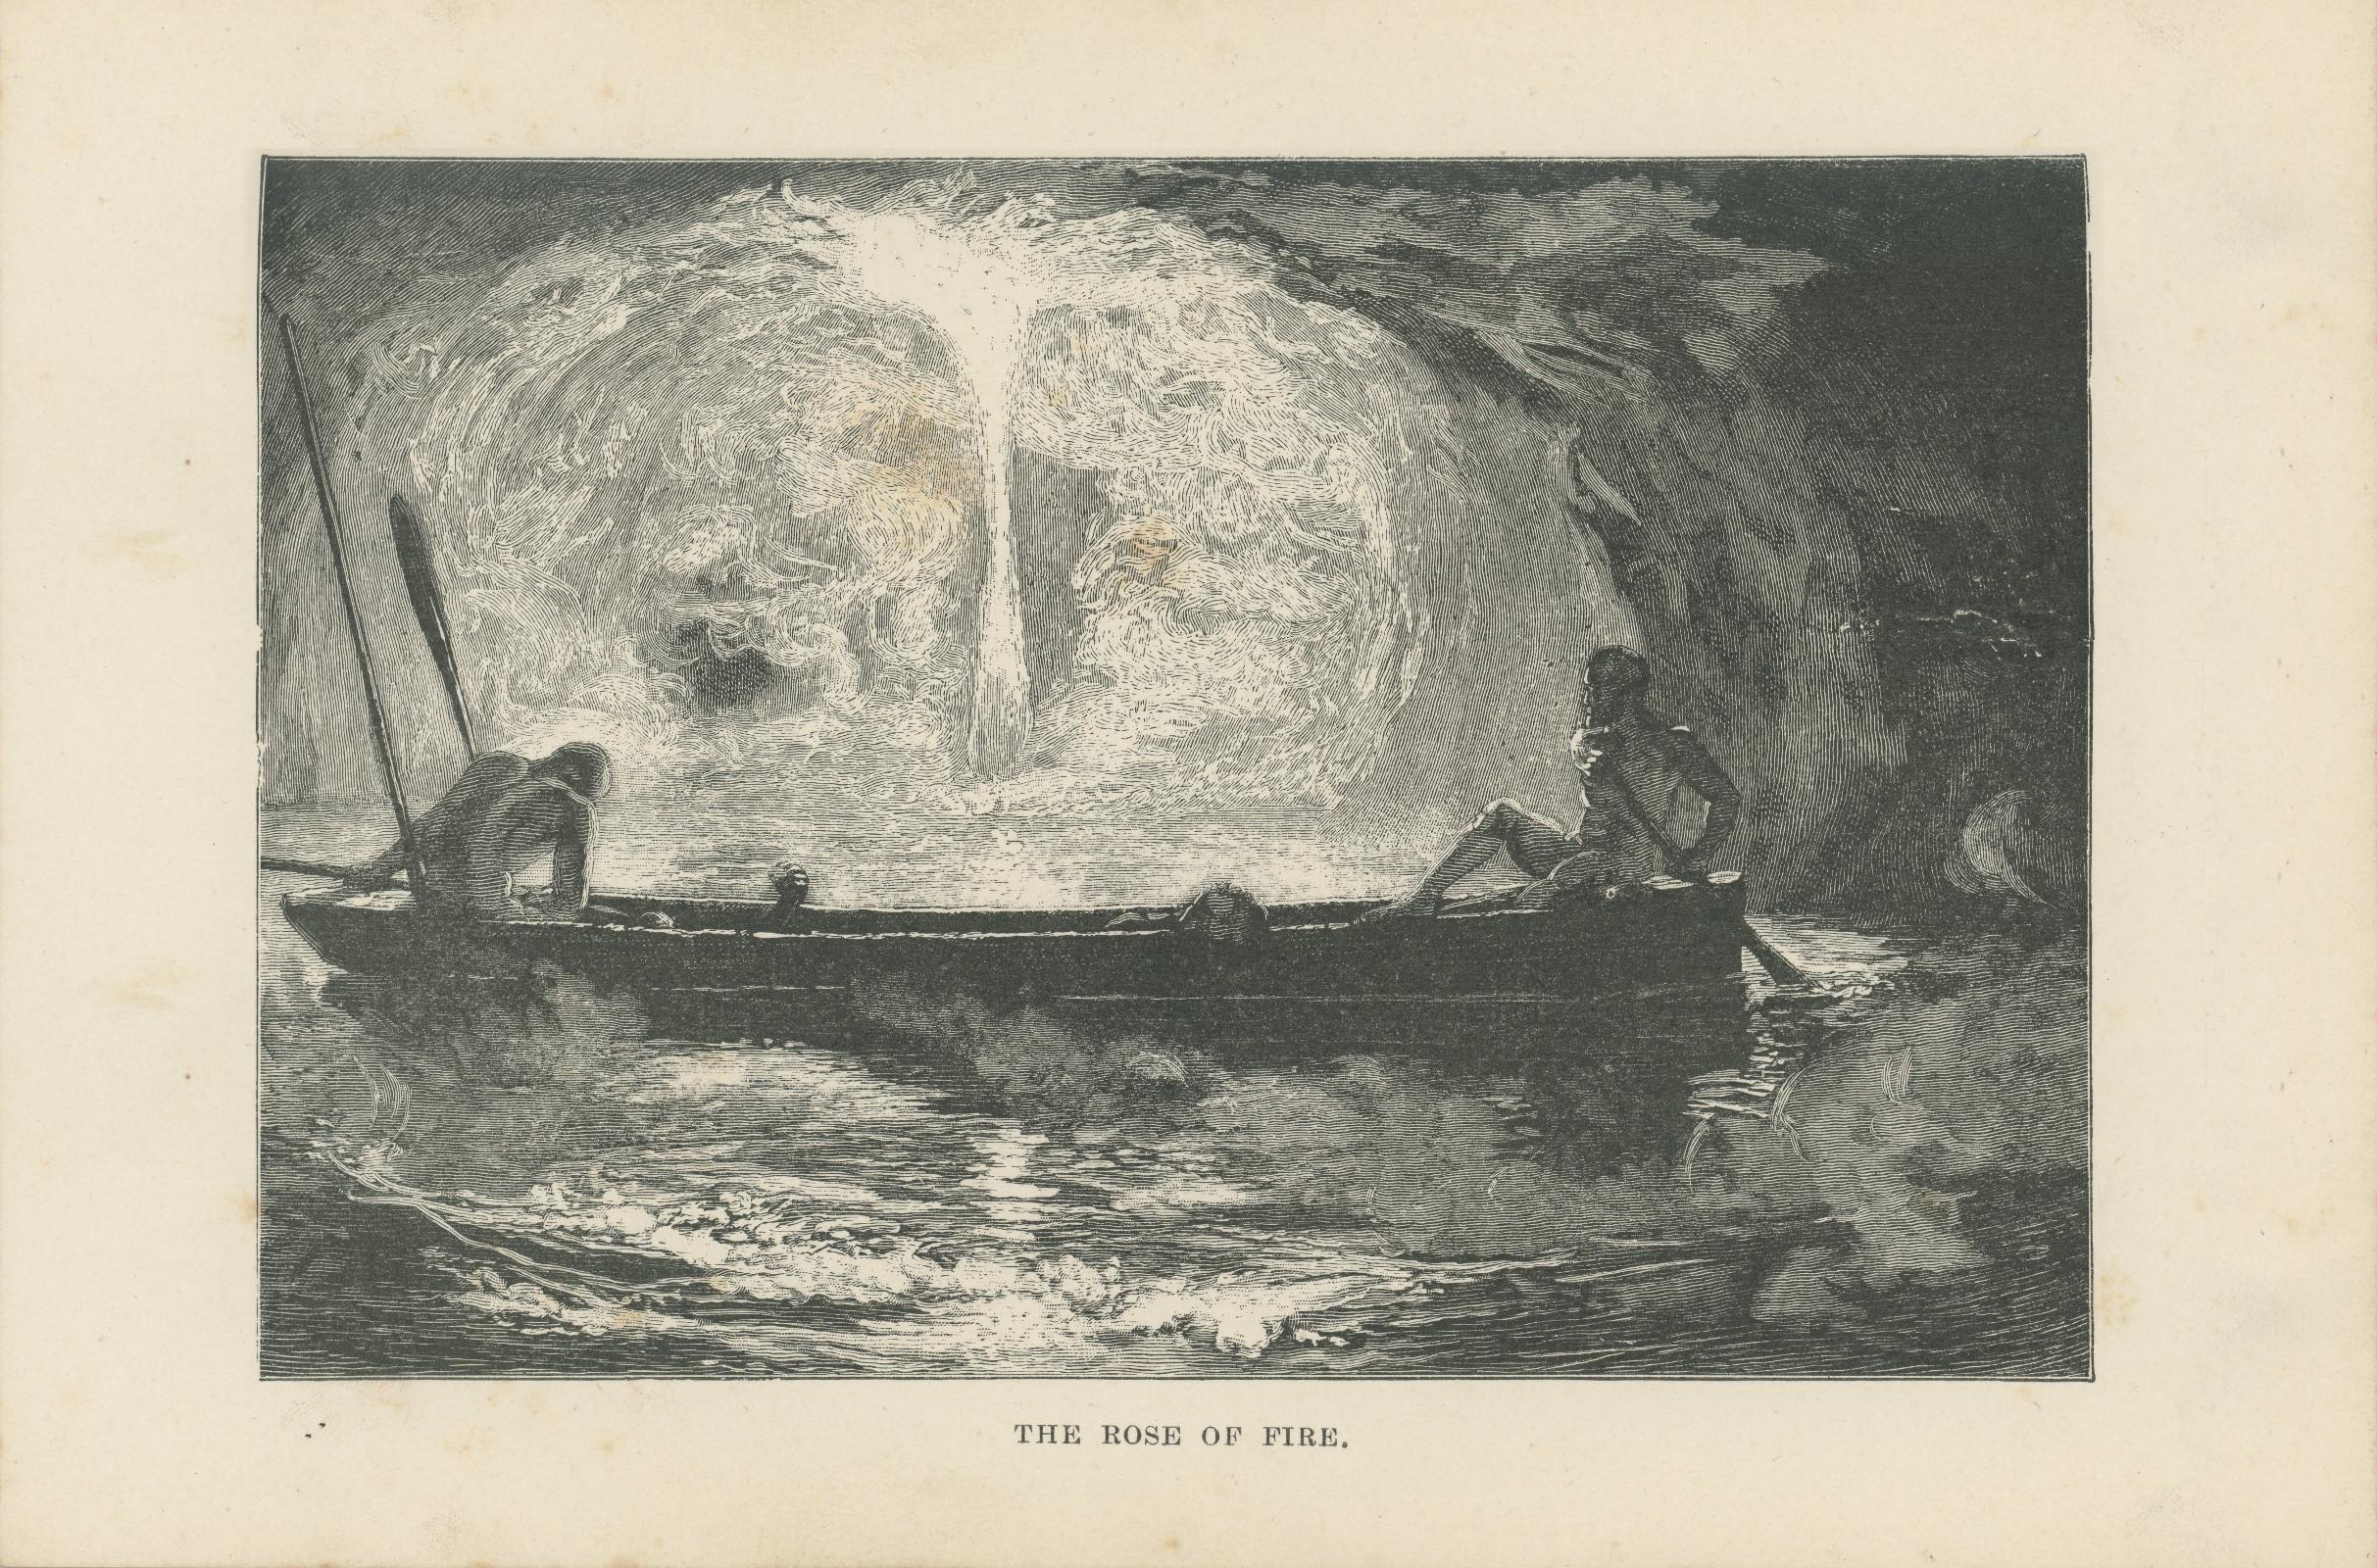 Therose1893110